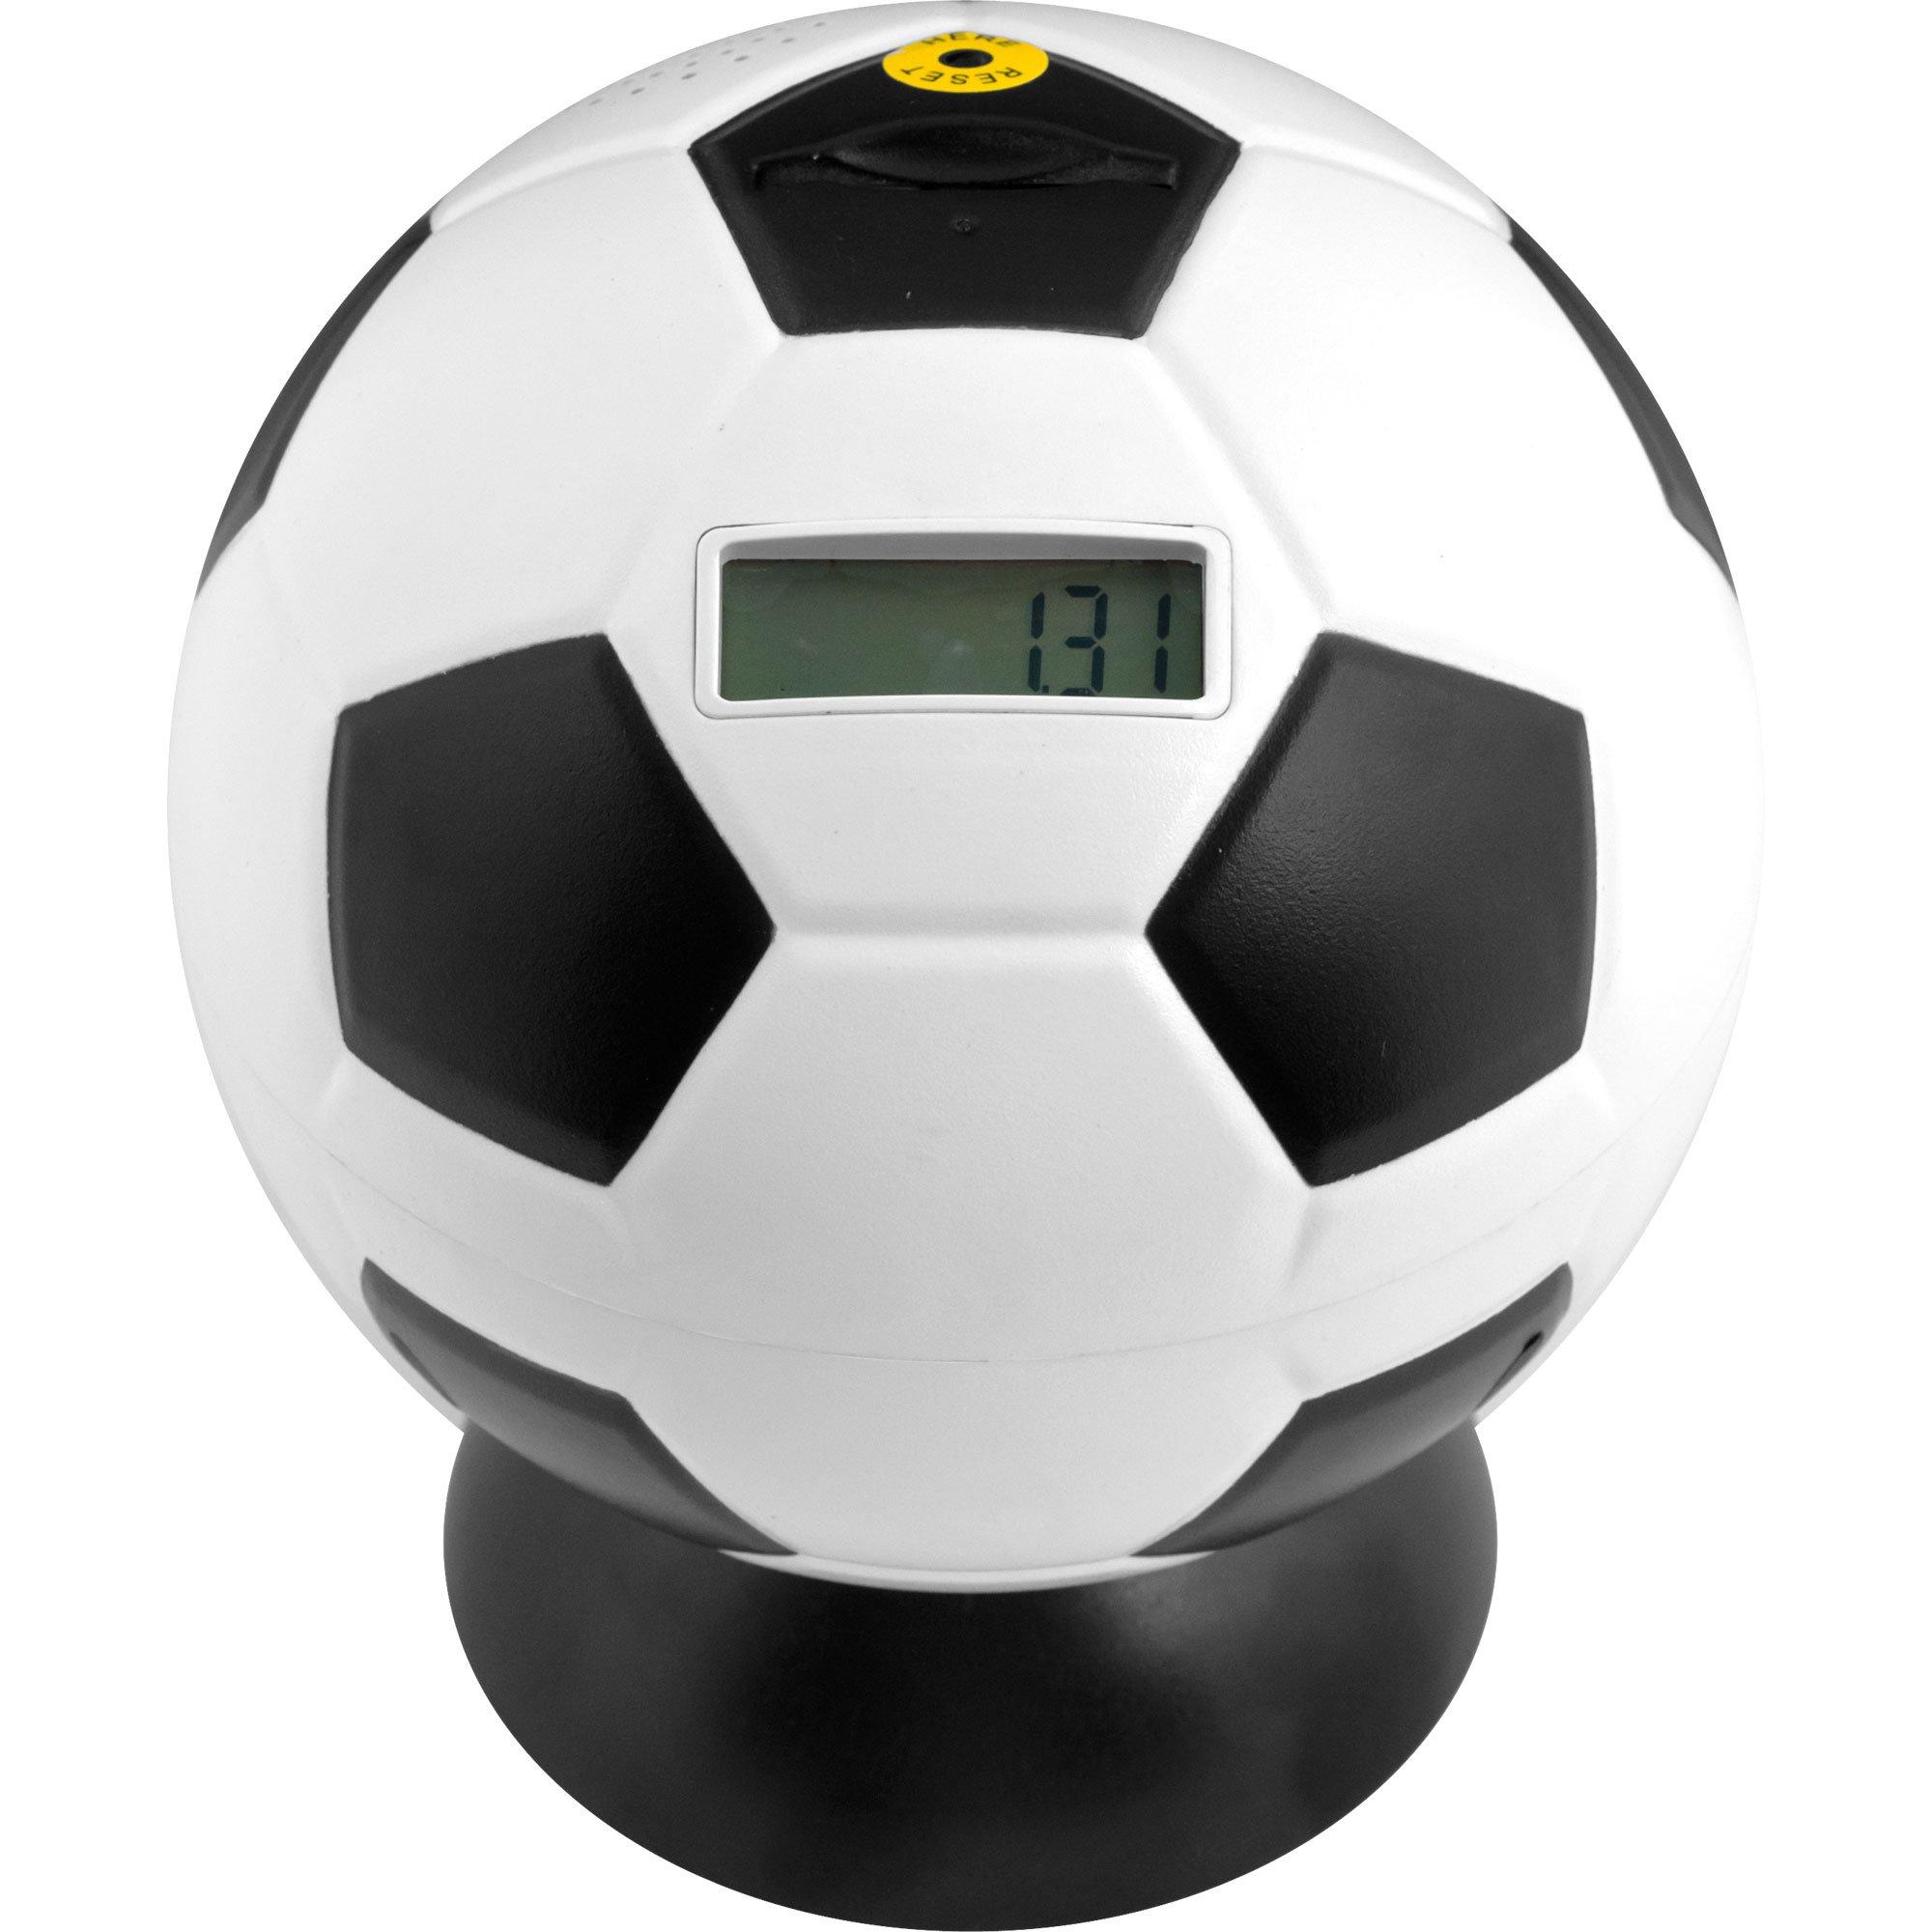 Trademark Games Soccer Ball Digital Coin Counting Bank